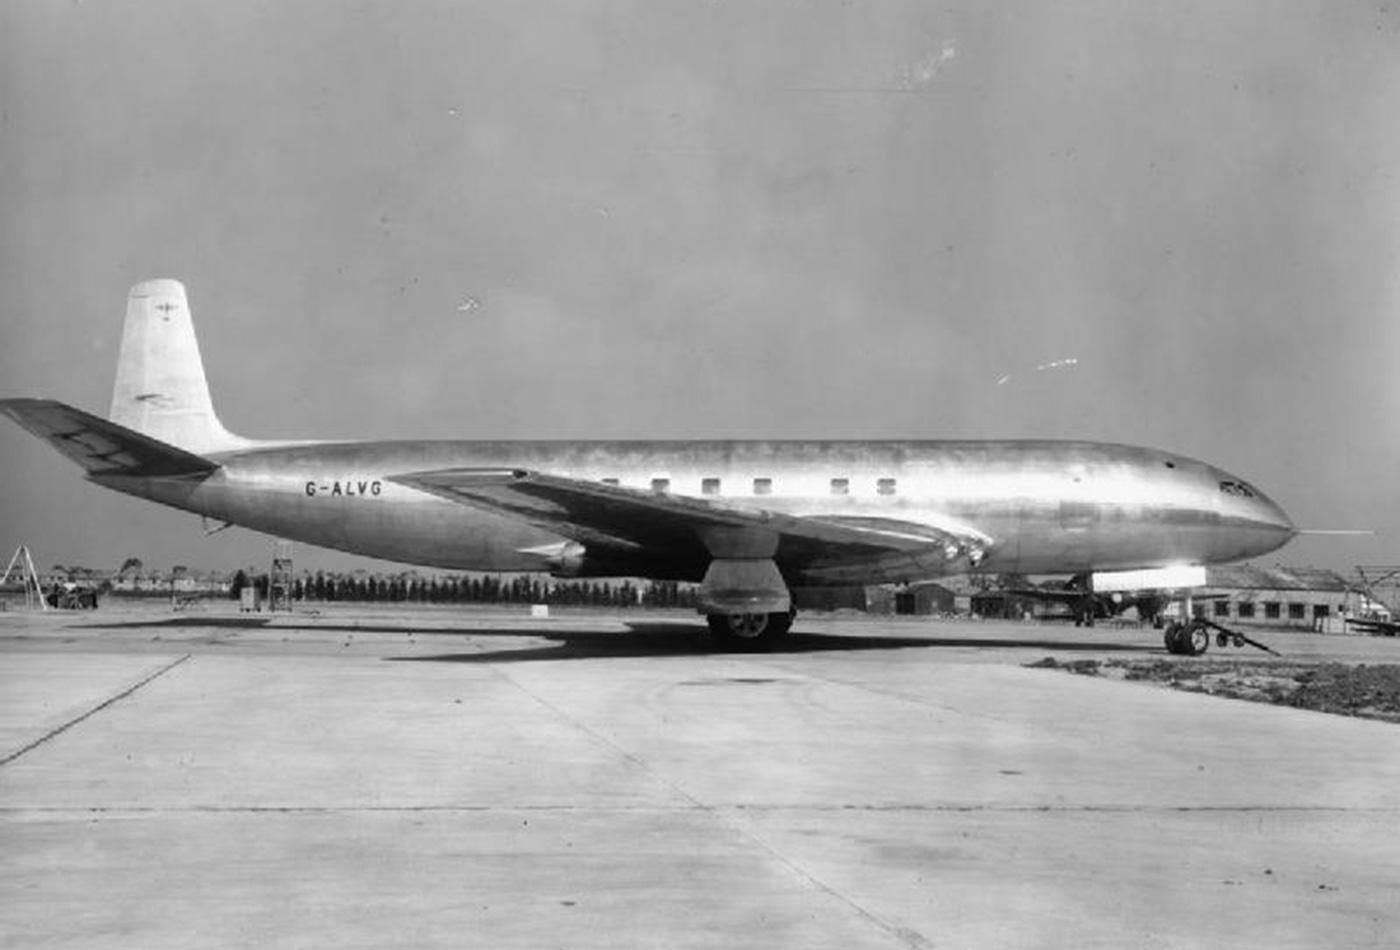 The first prototype de Havilland DH106 Comet at Hatfield, 1949.